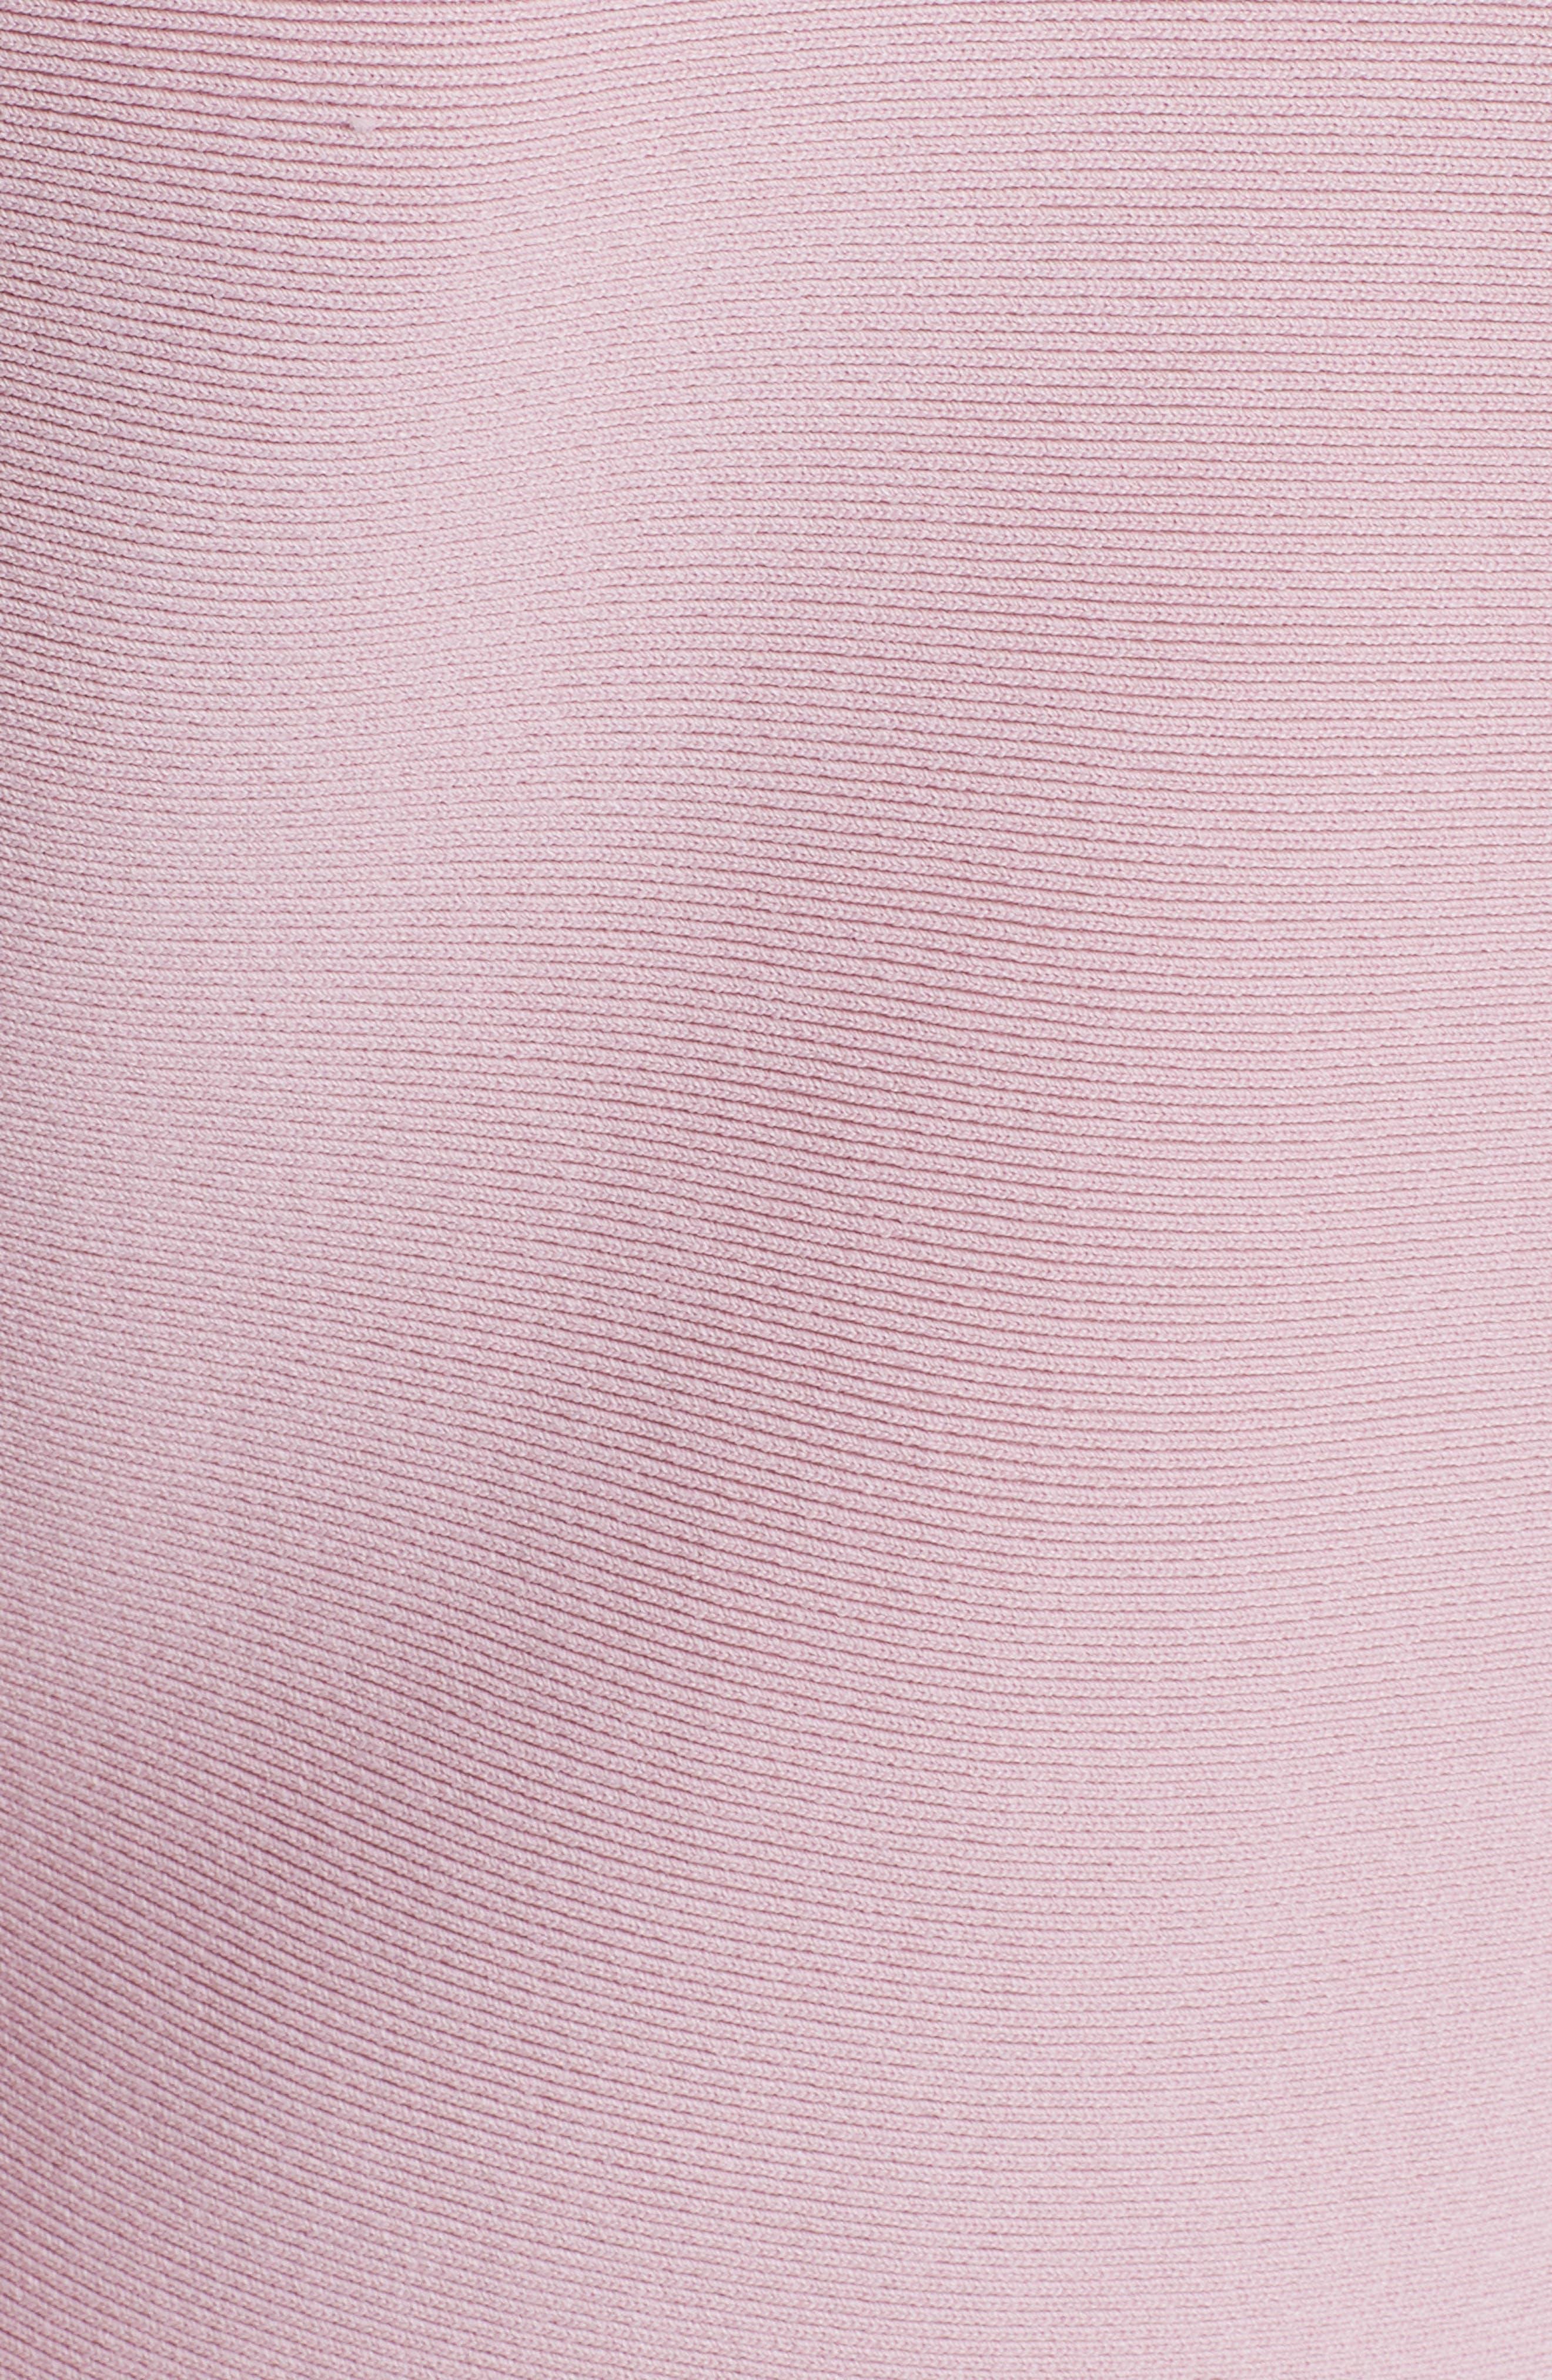 Hinlia Peplum Sweater,                             Alternate thumbnail 5, color,                             DUSKY PINK